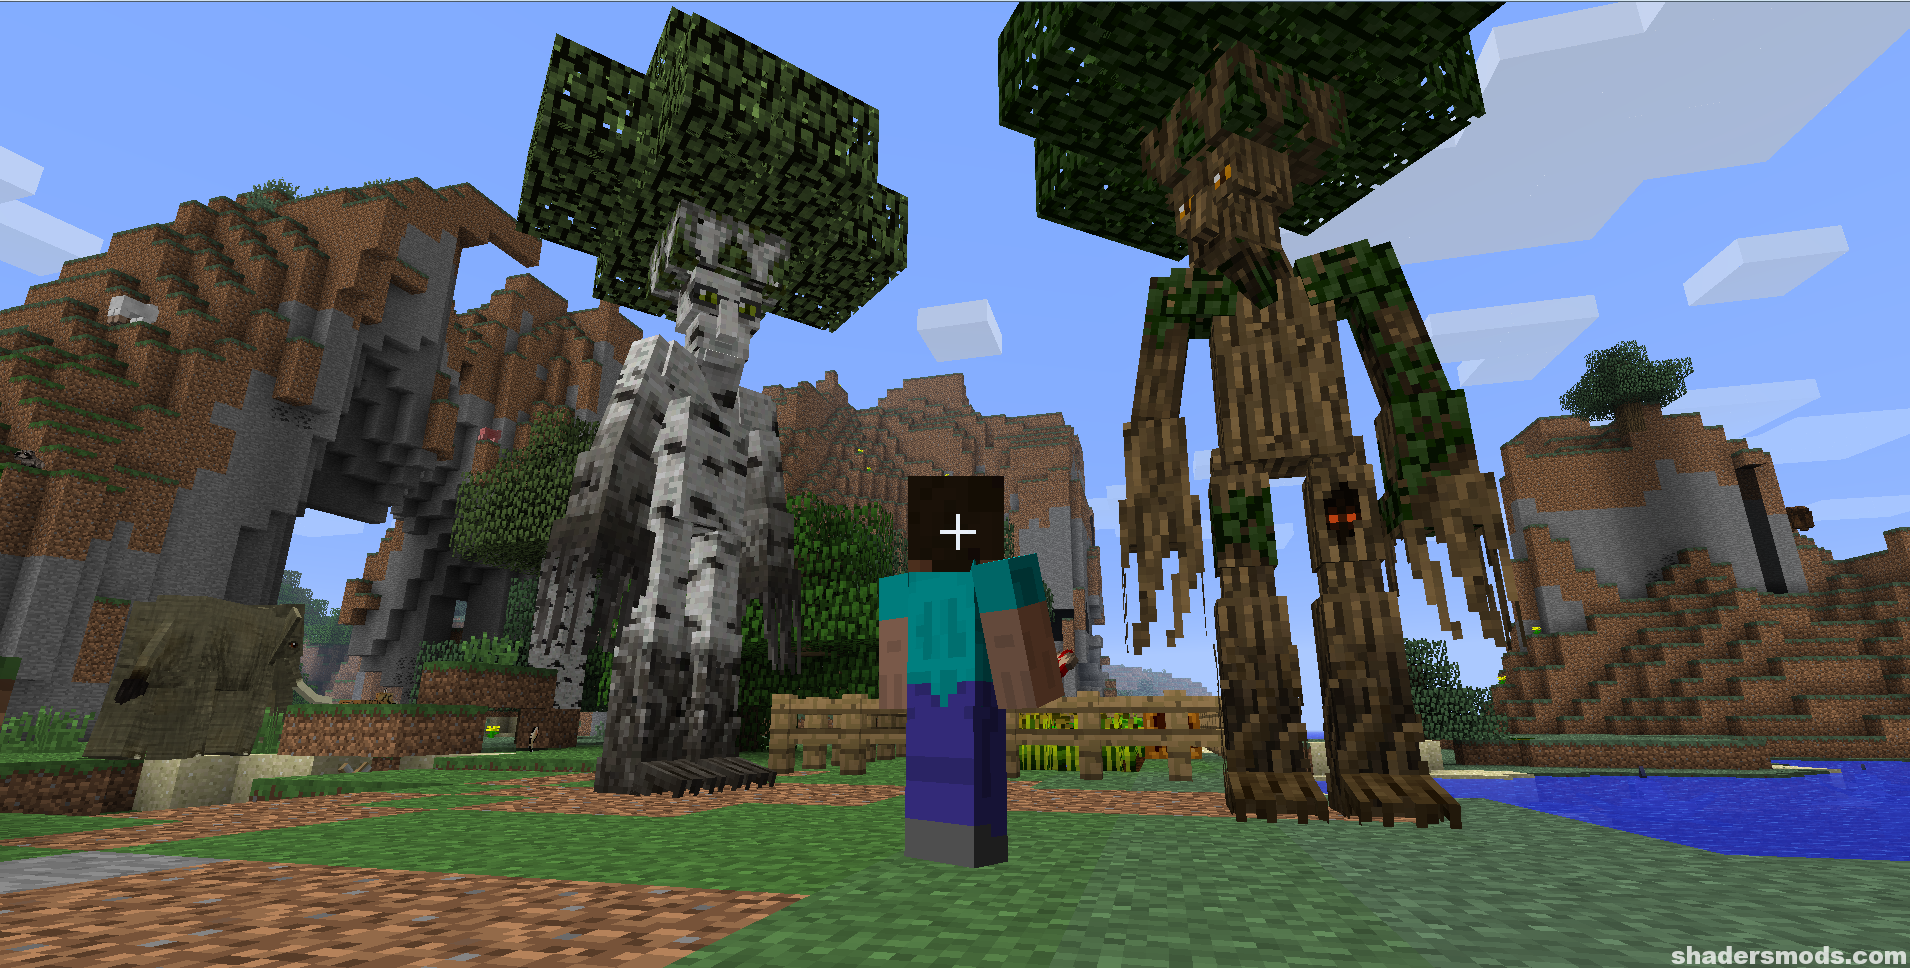 mo-creatures-mod-minecraft-2